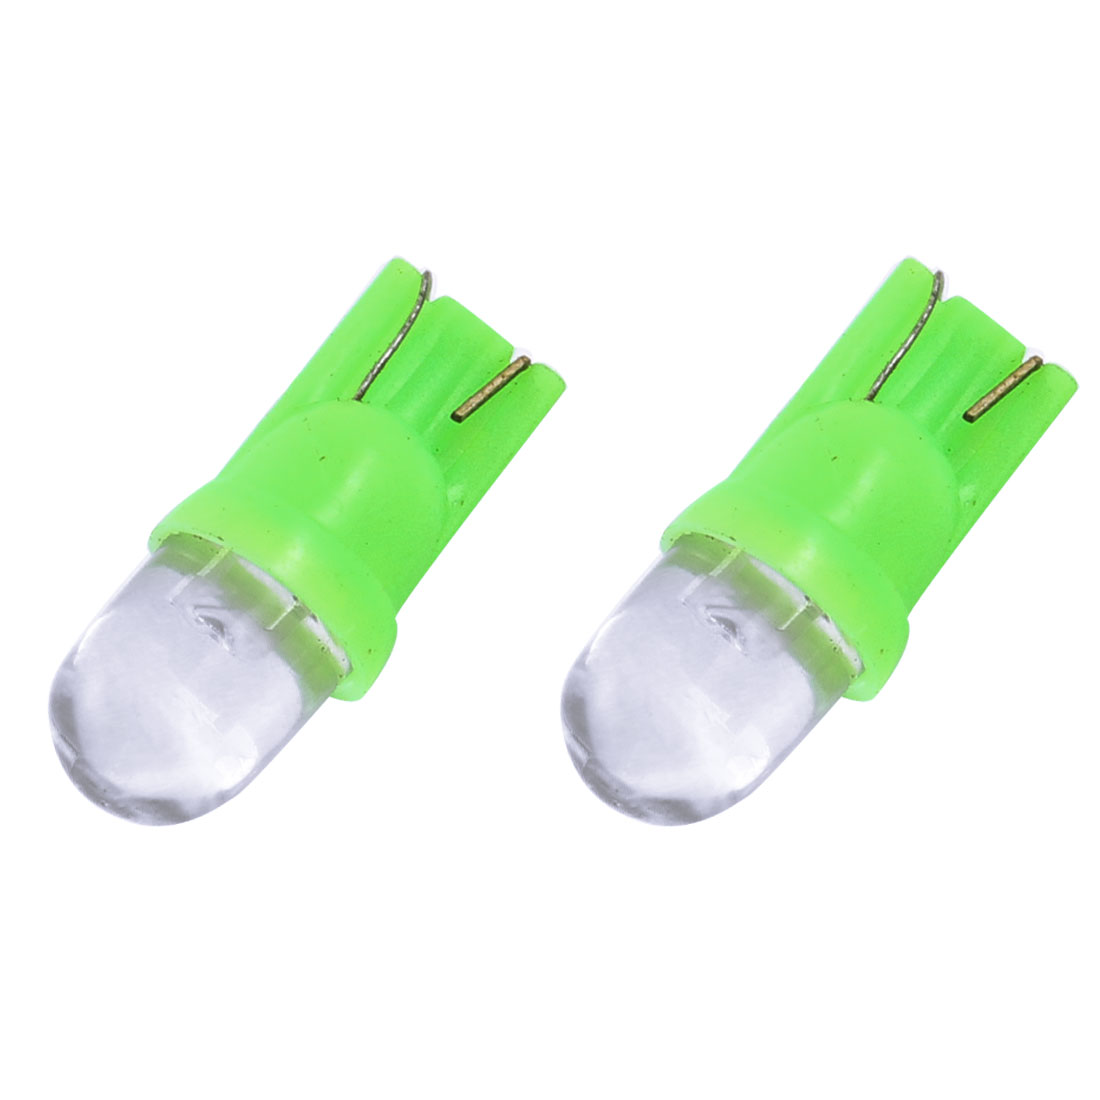 2 Pcs DC 12V Auto Motorbike T10 Green LED Lens Gauge Panel Light Bulbs Lamp